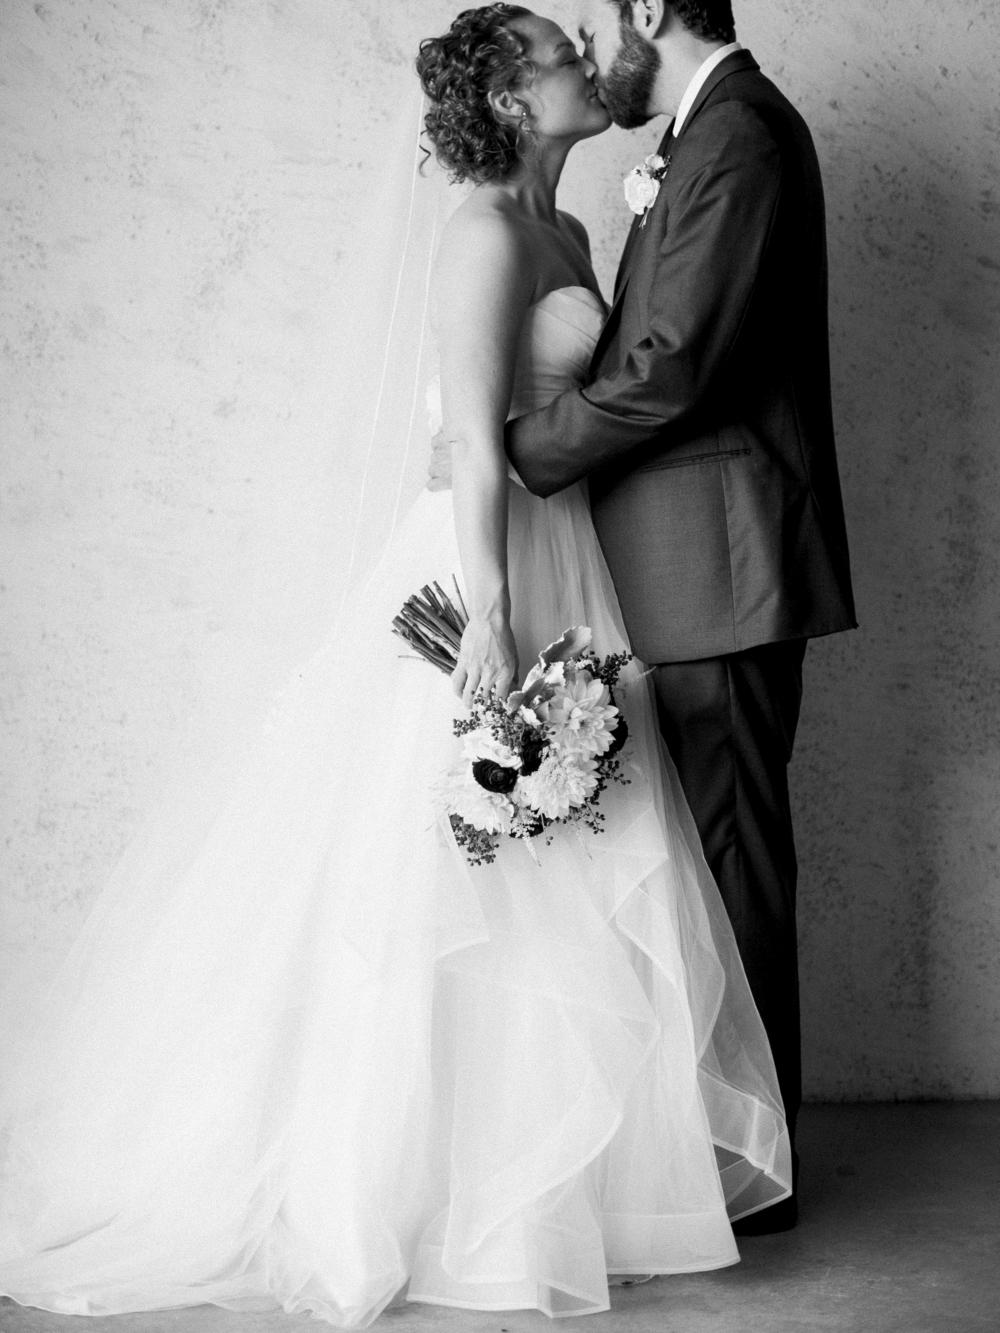 Bride&Groom92Cortney B Photography.JPG